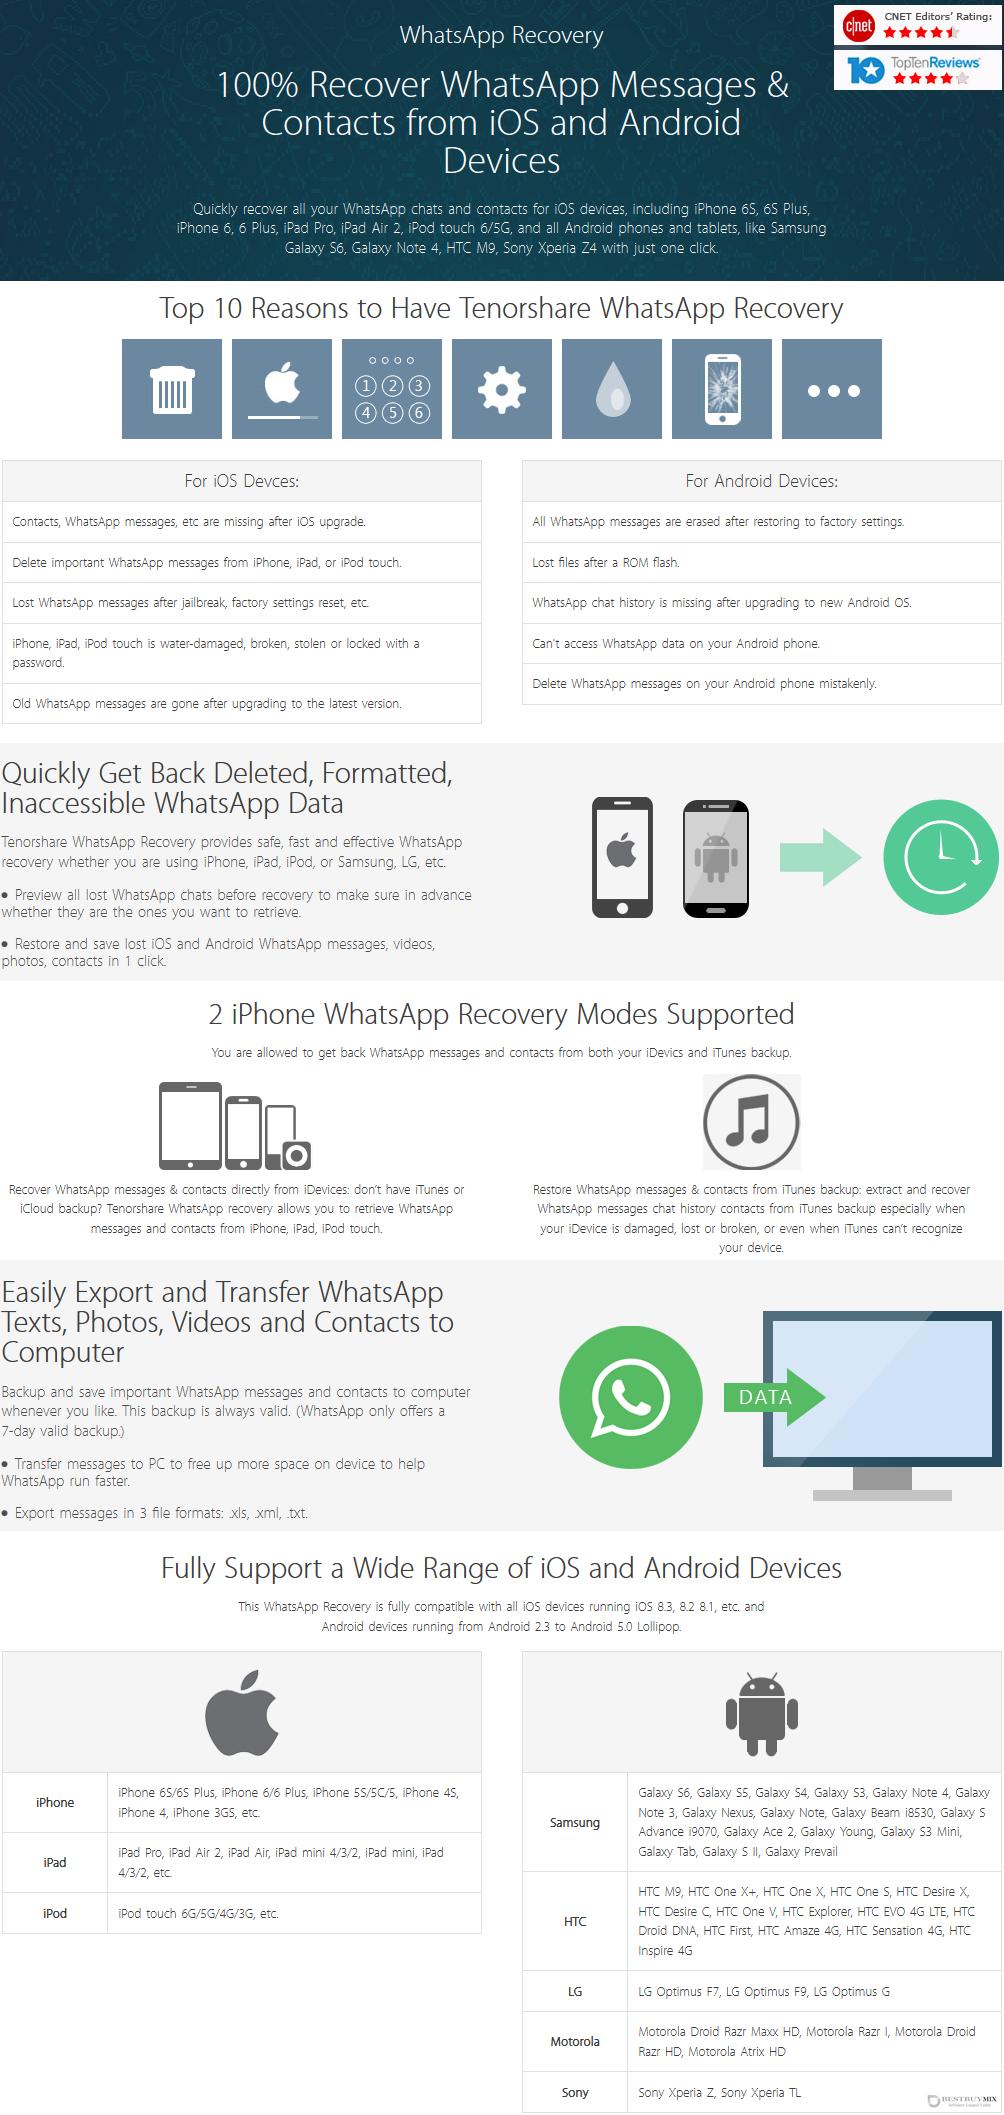 Tenorshare WhatsApp Recovery Discount Coupon Code